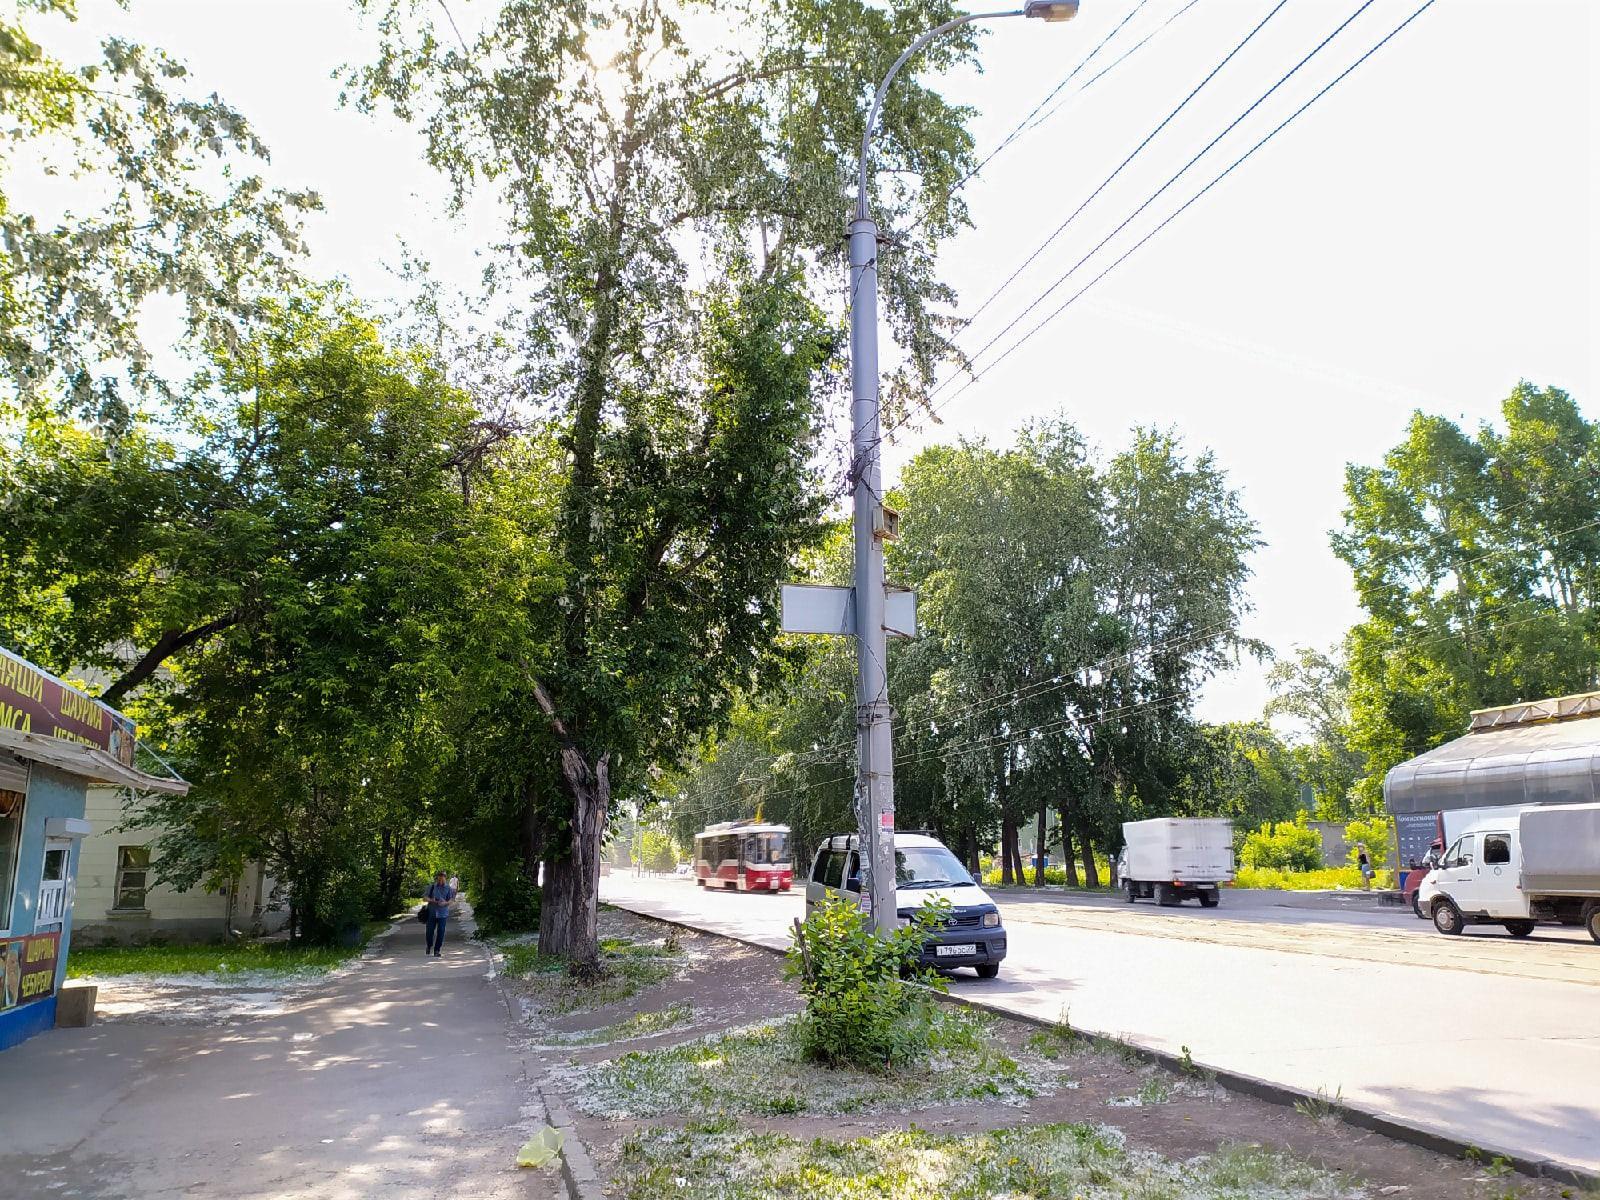 фото Сезон тополиного пуха начался в Новосибирске 2